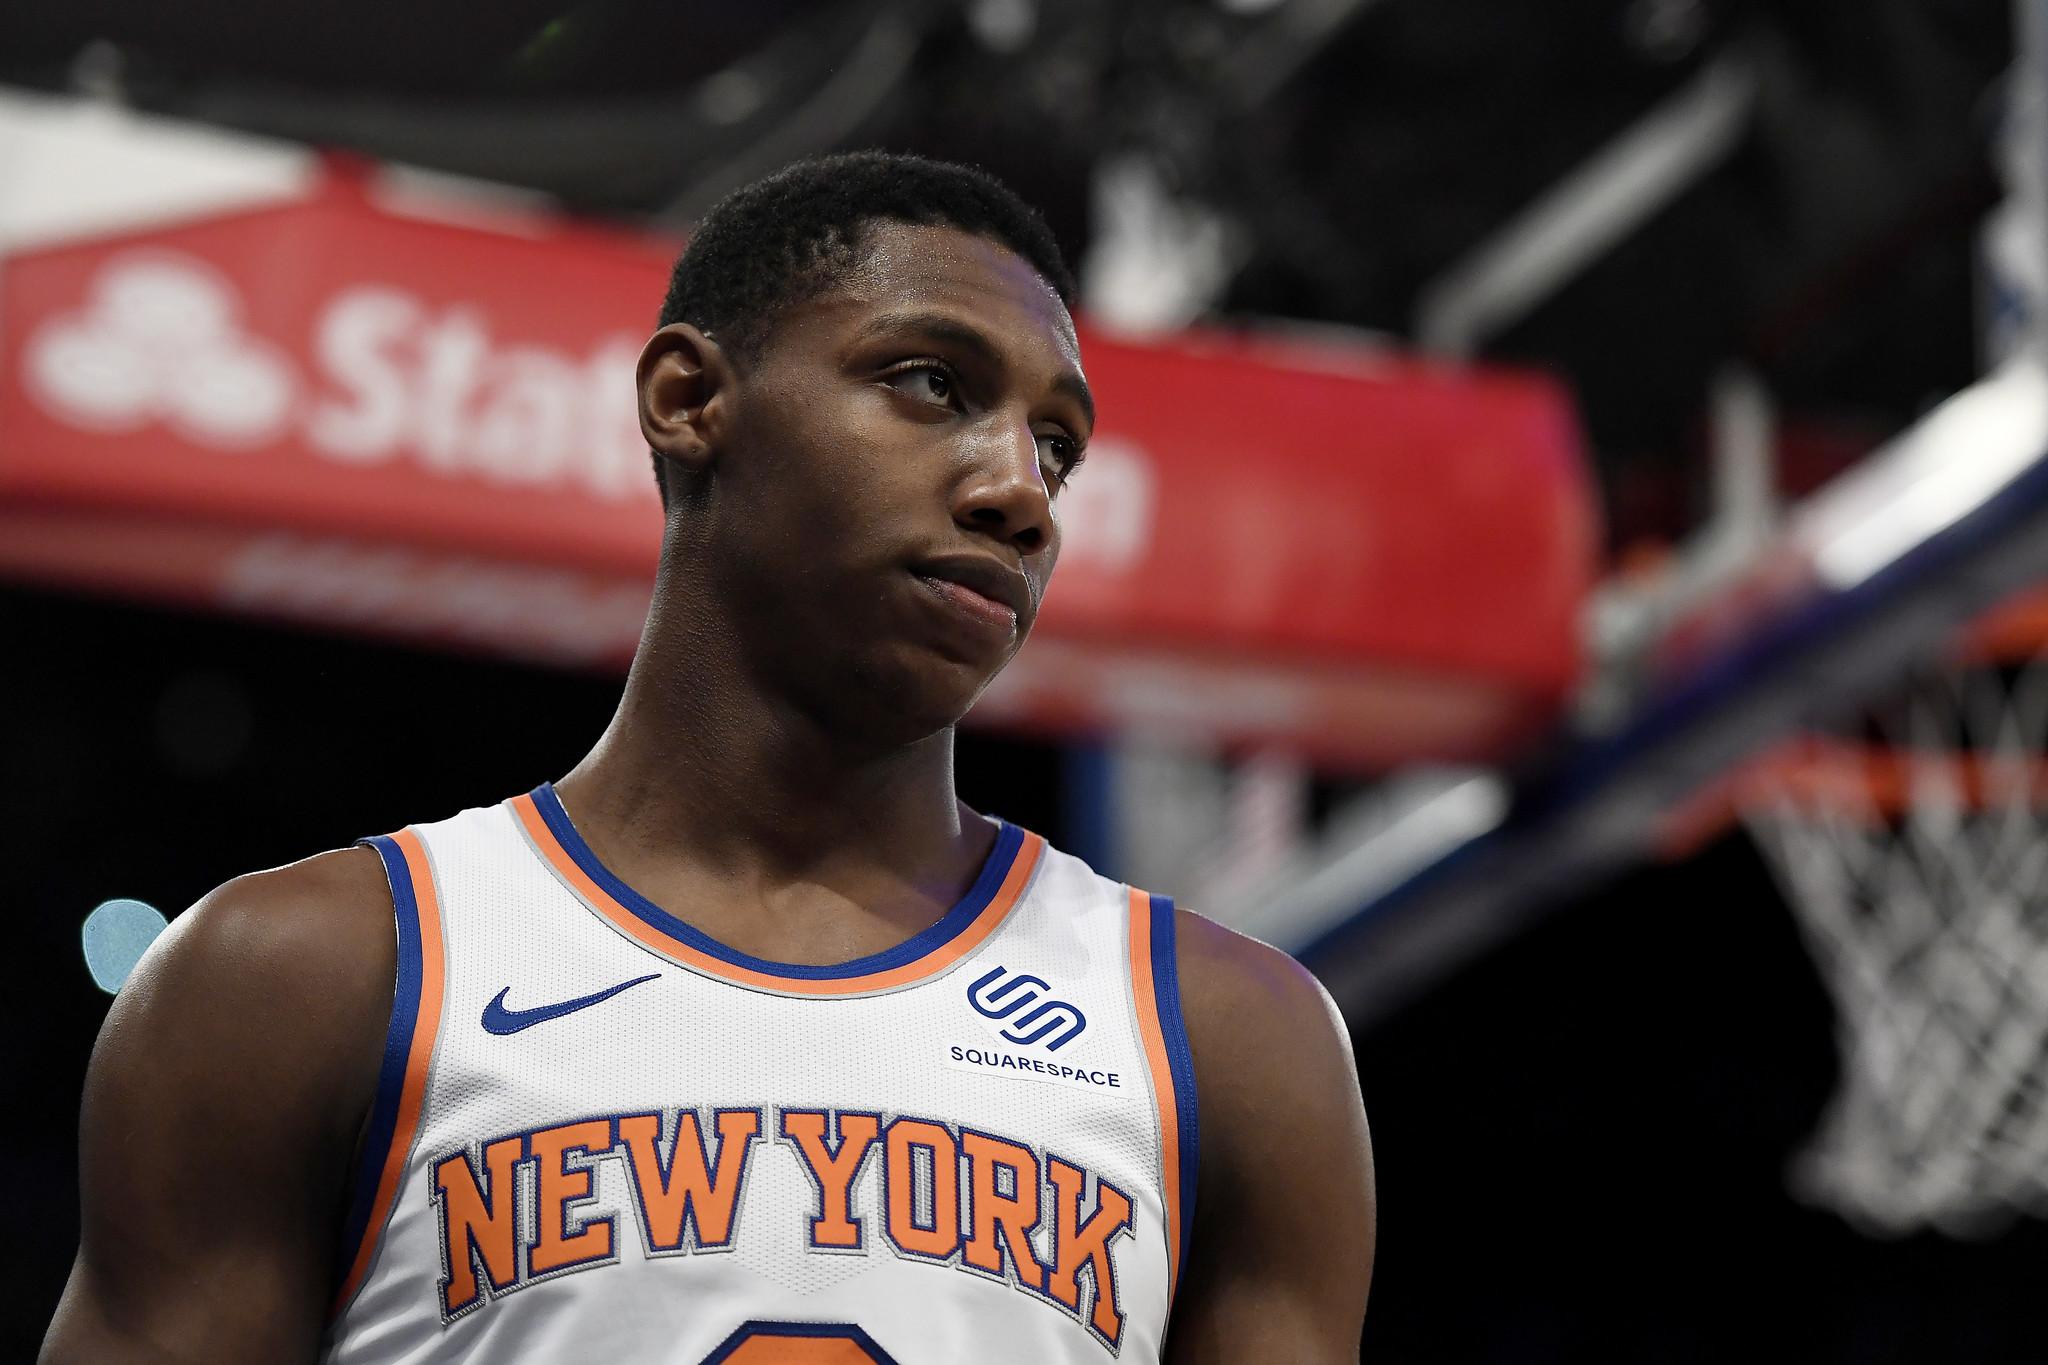 RJ Barrett drops 'Maple Mamba' nickname out of respect for Kobe Bryant